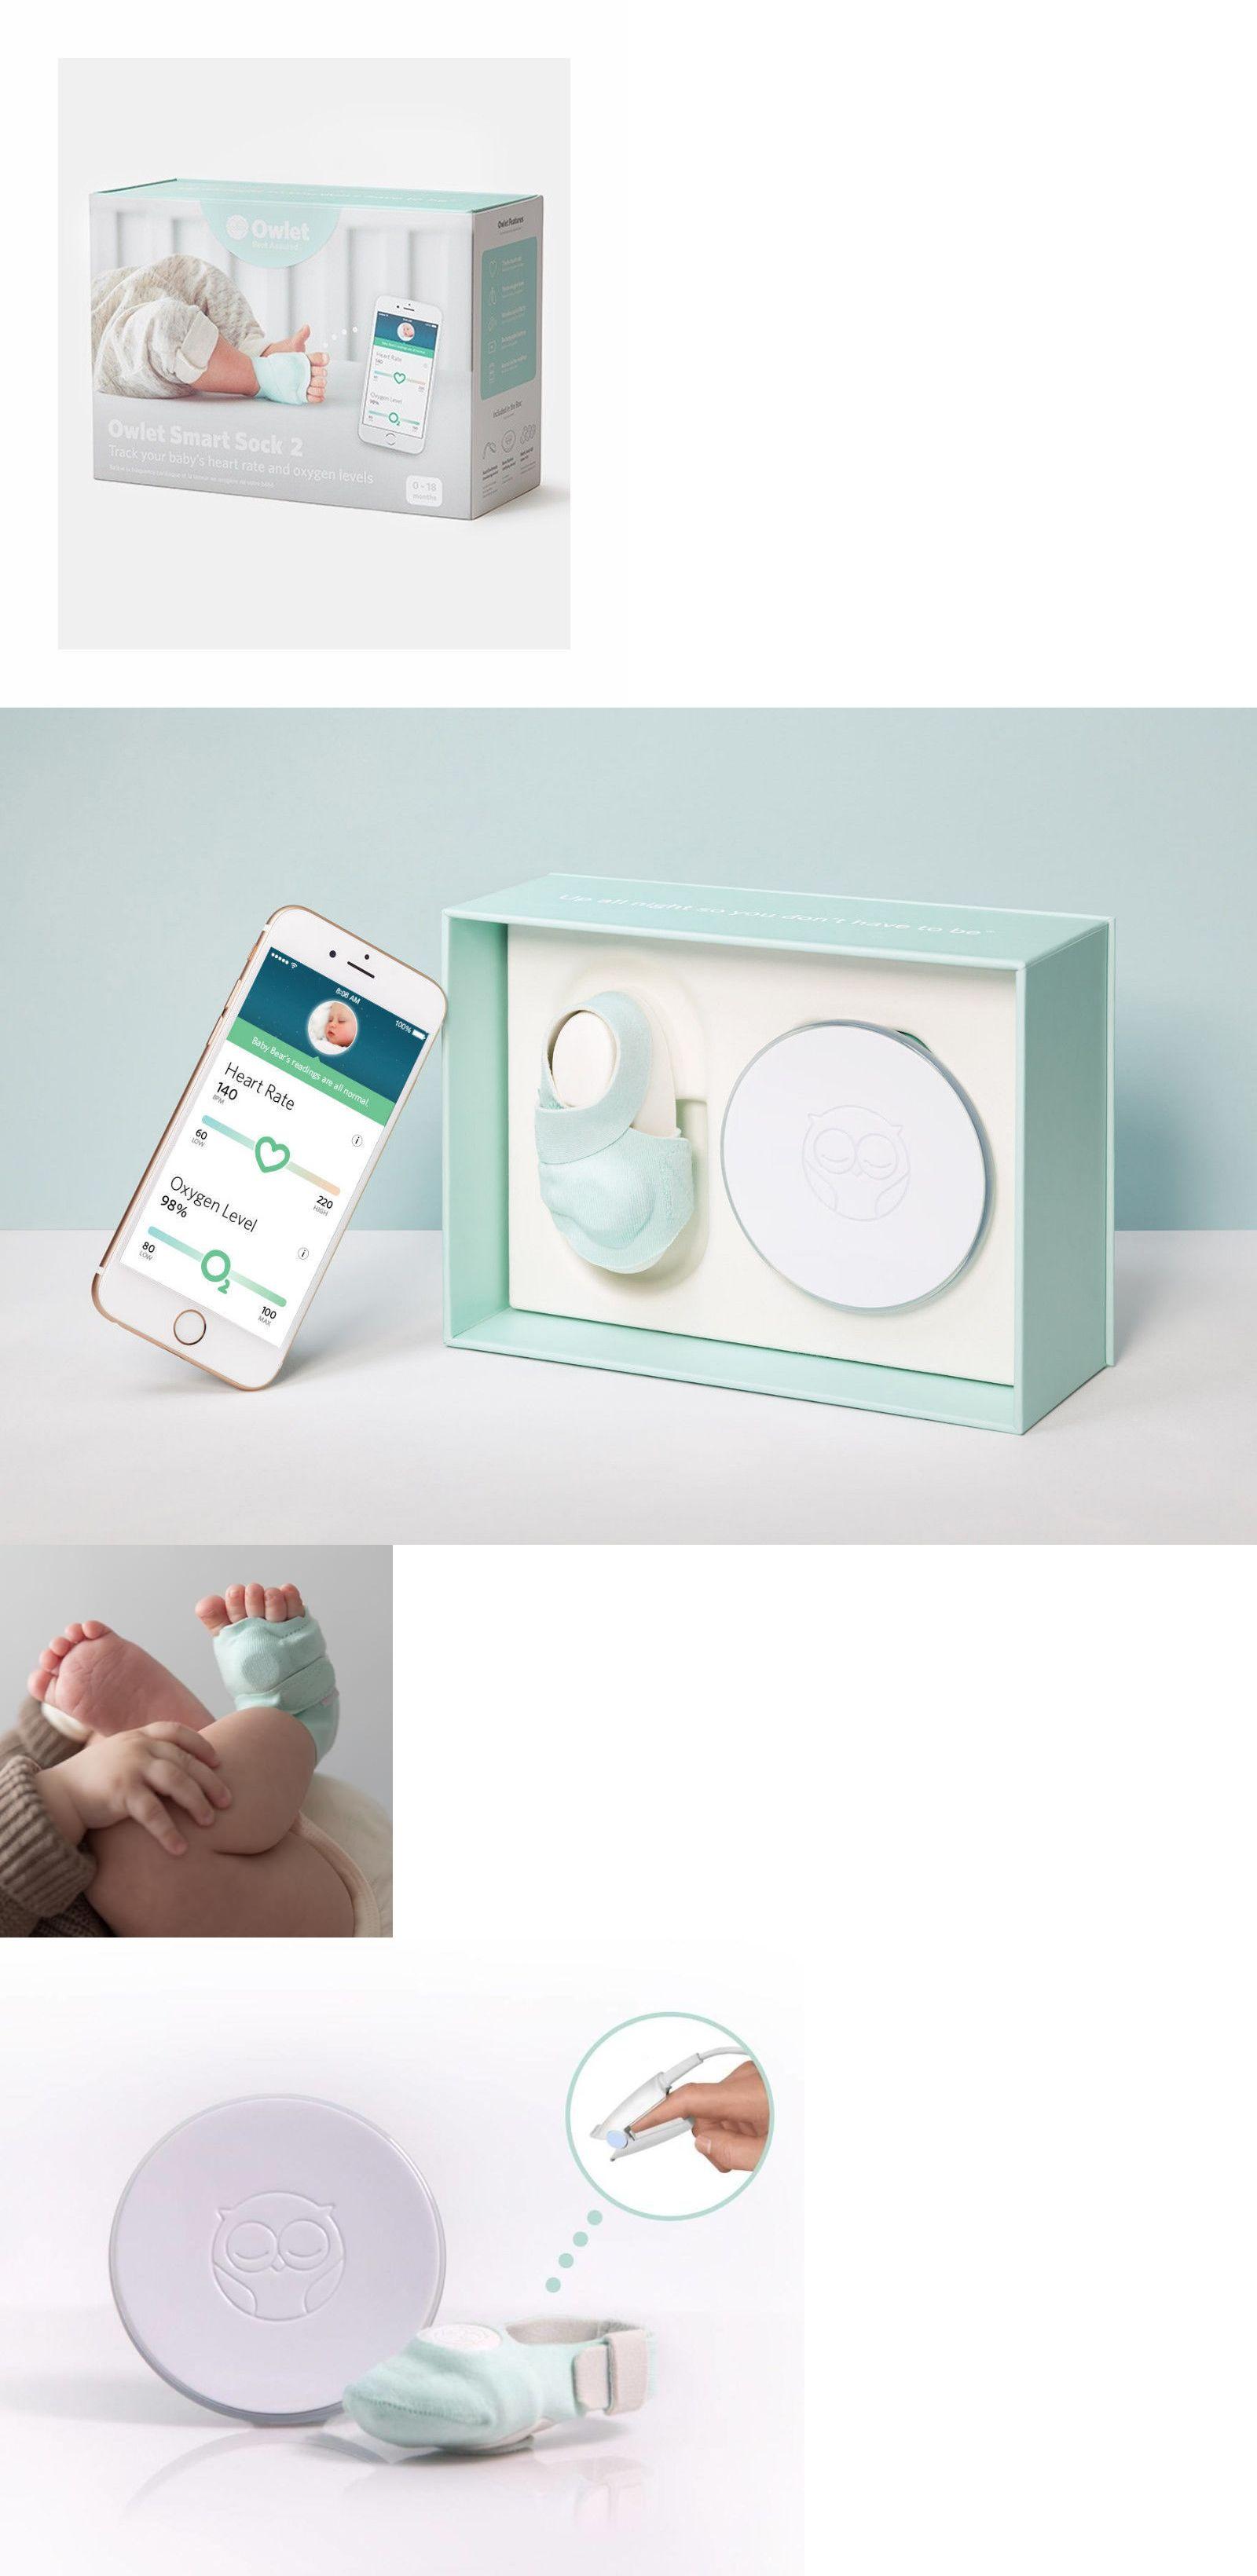 Baby Monitors Owlet Smart Sock 2 Baby Monitor New In Box